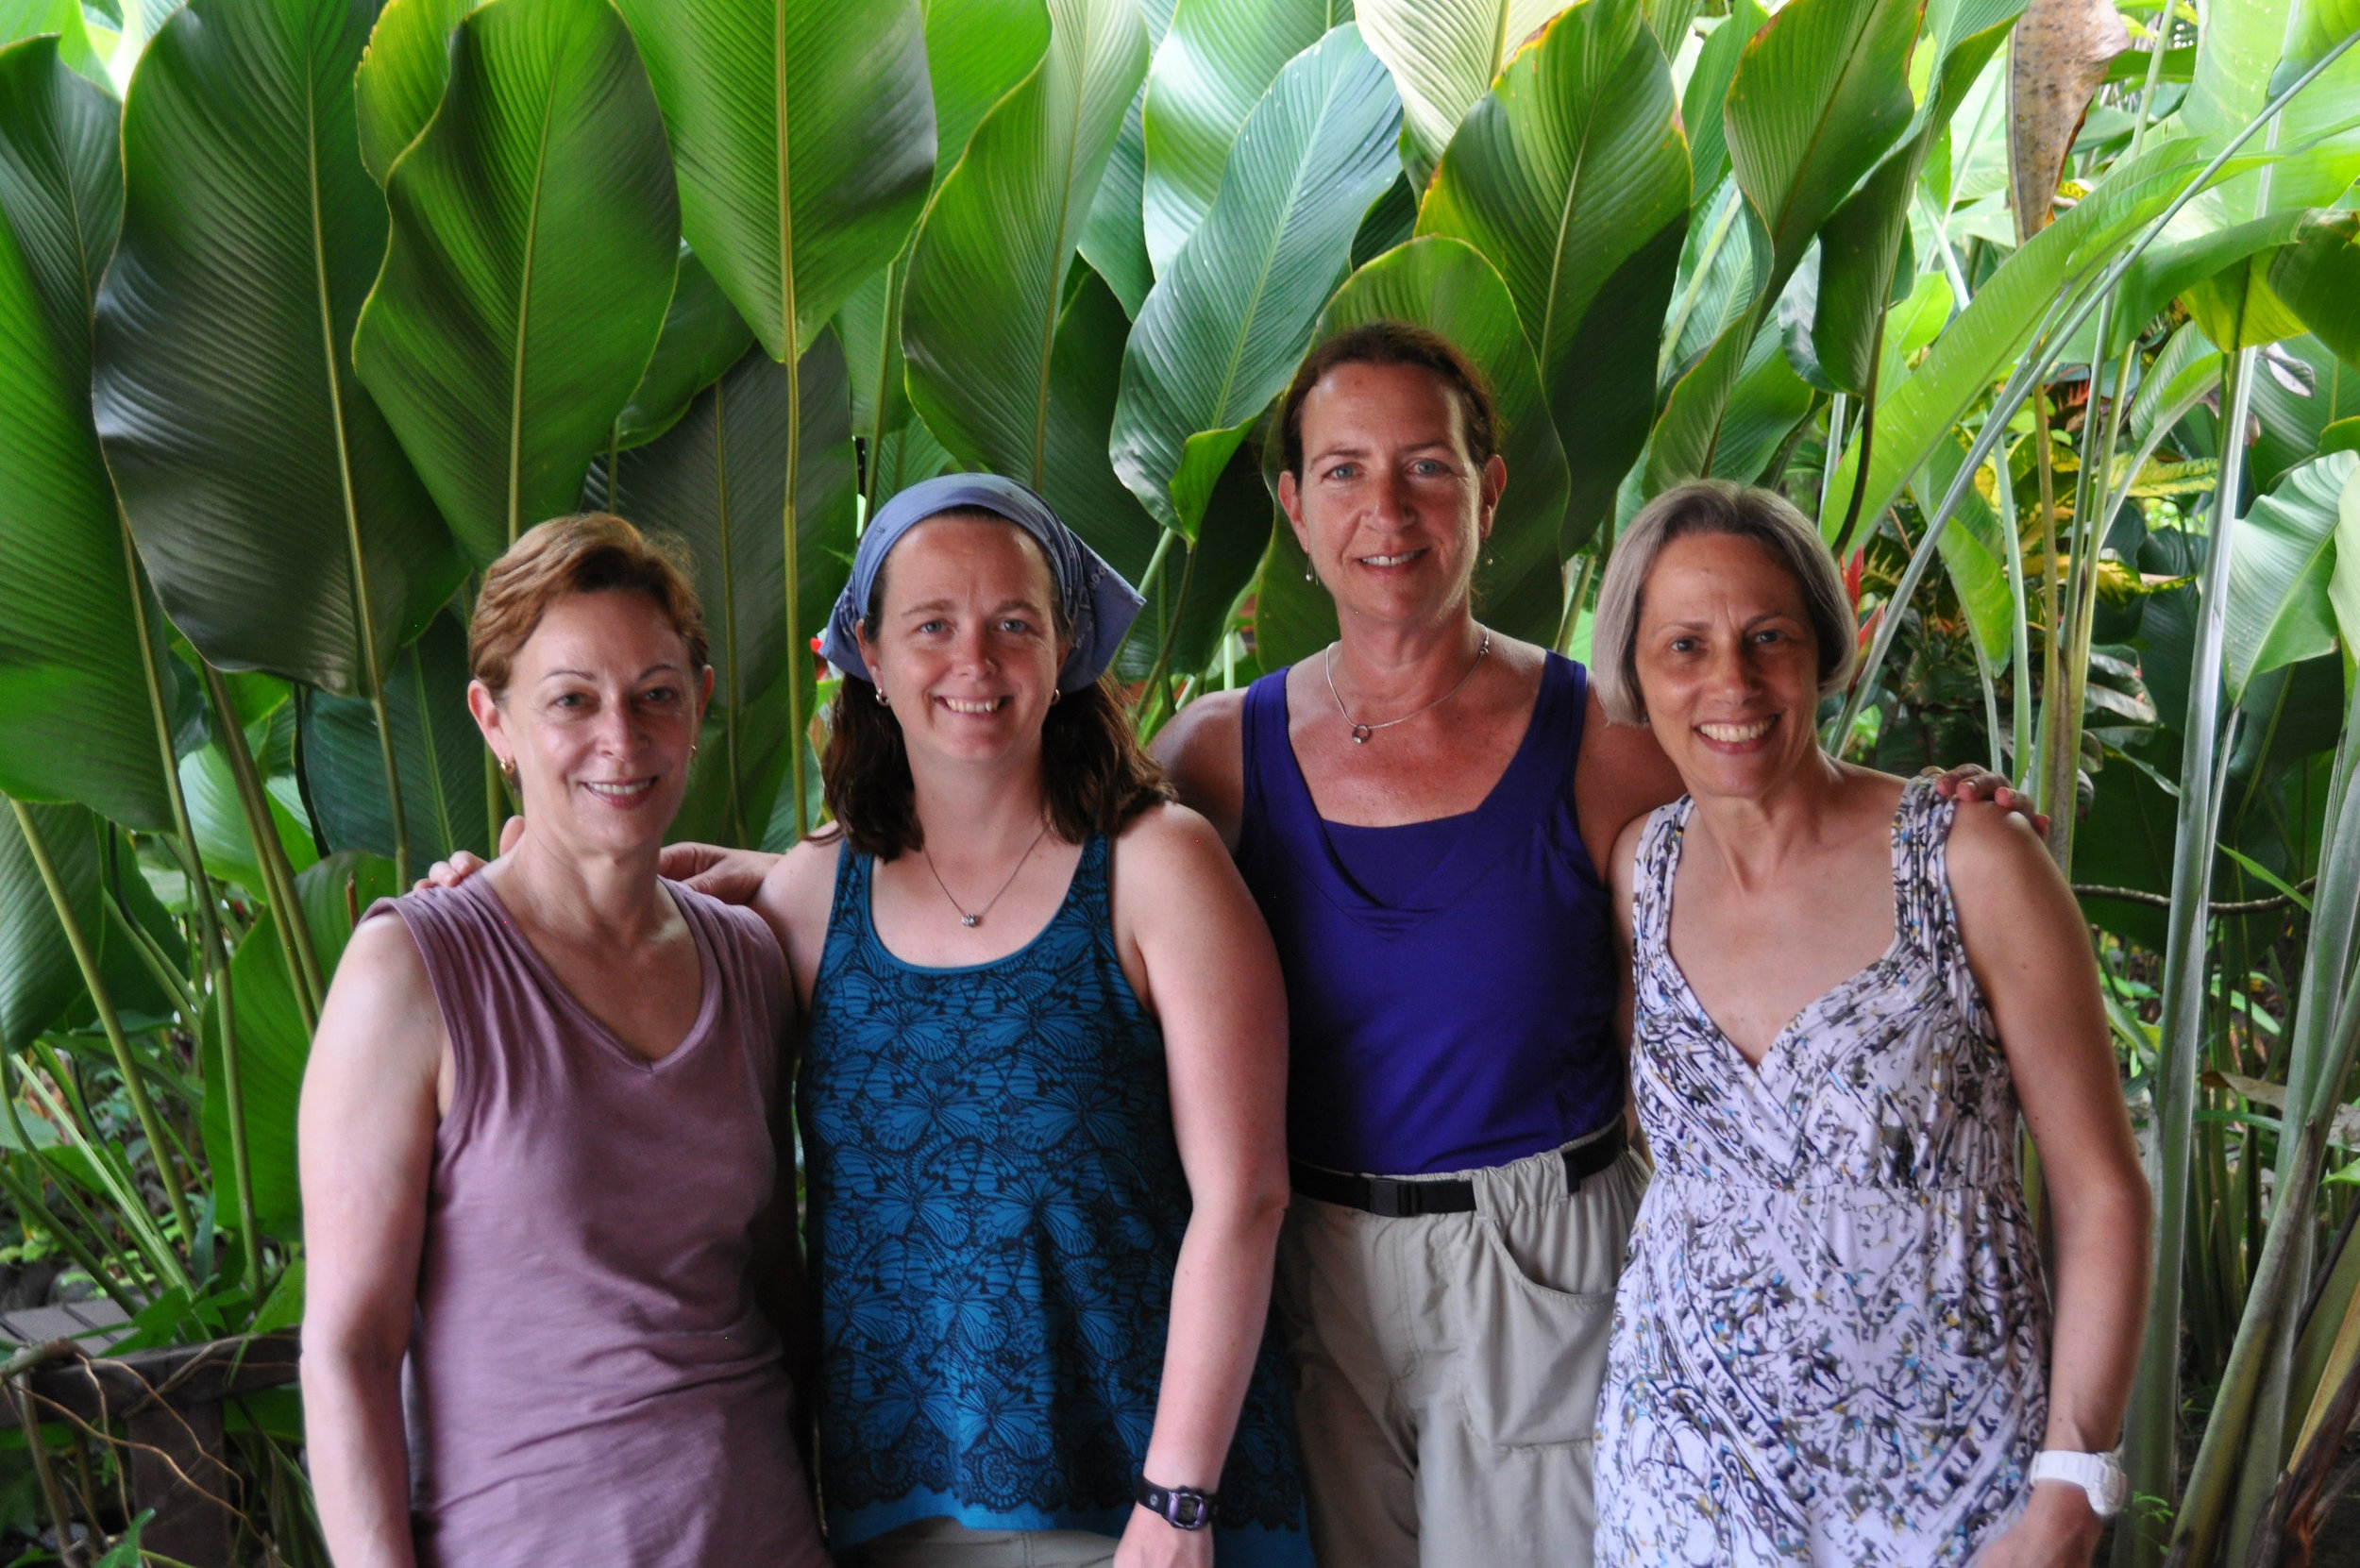 Ann Becker with Wonderful Women group